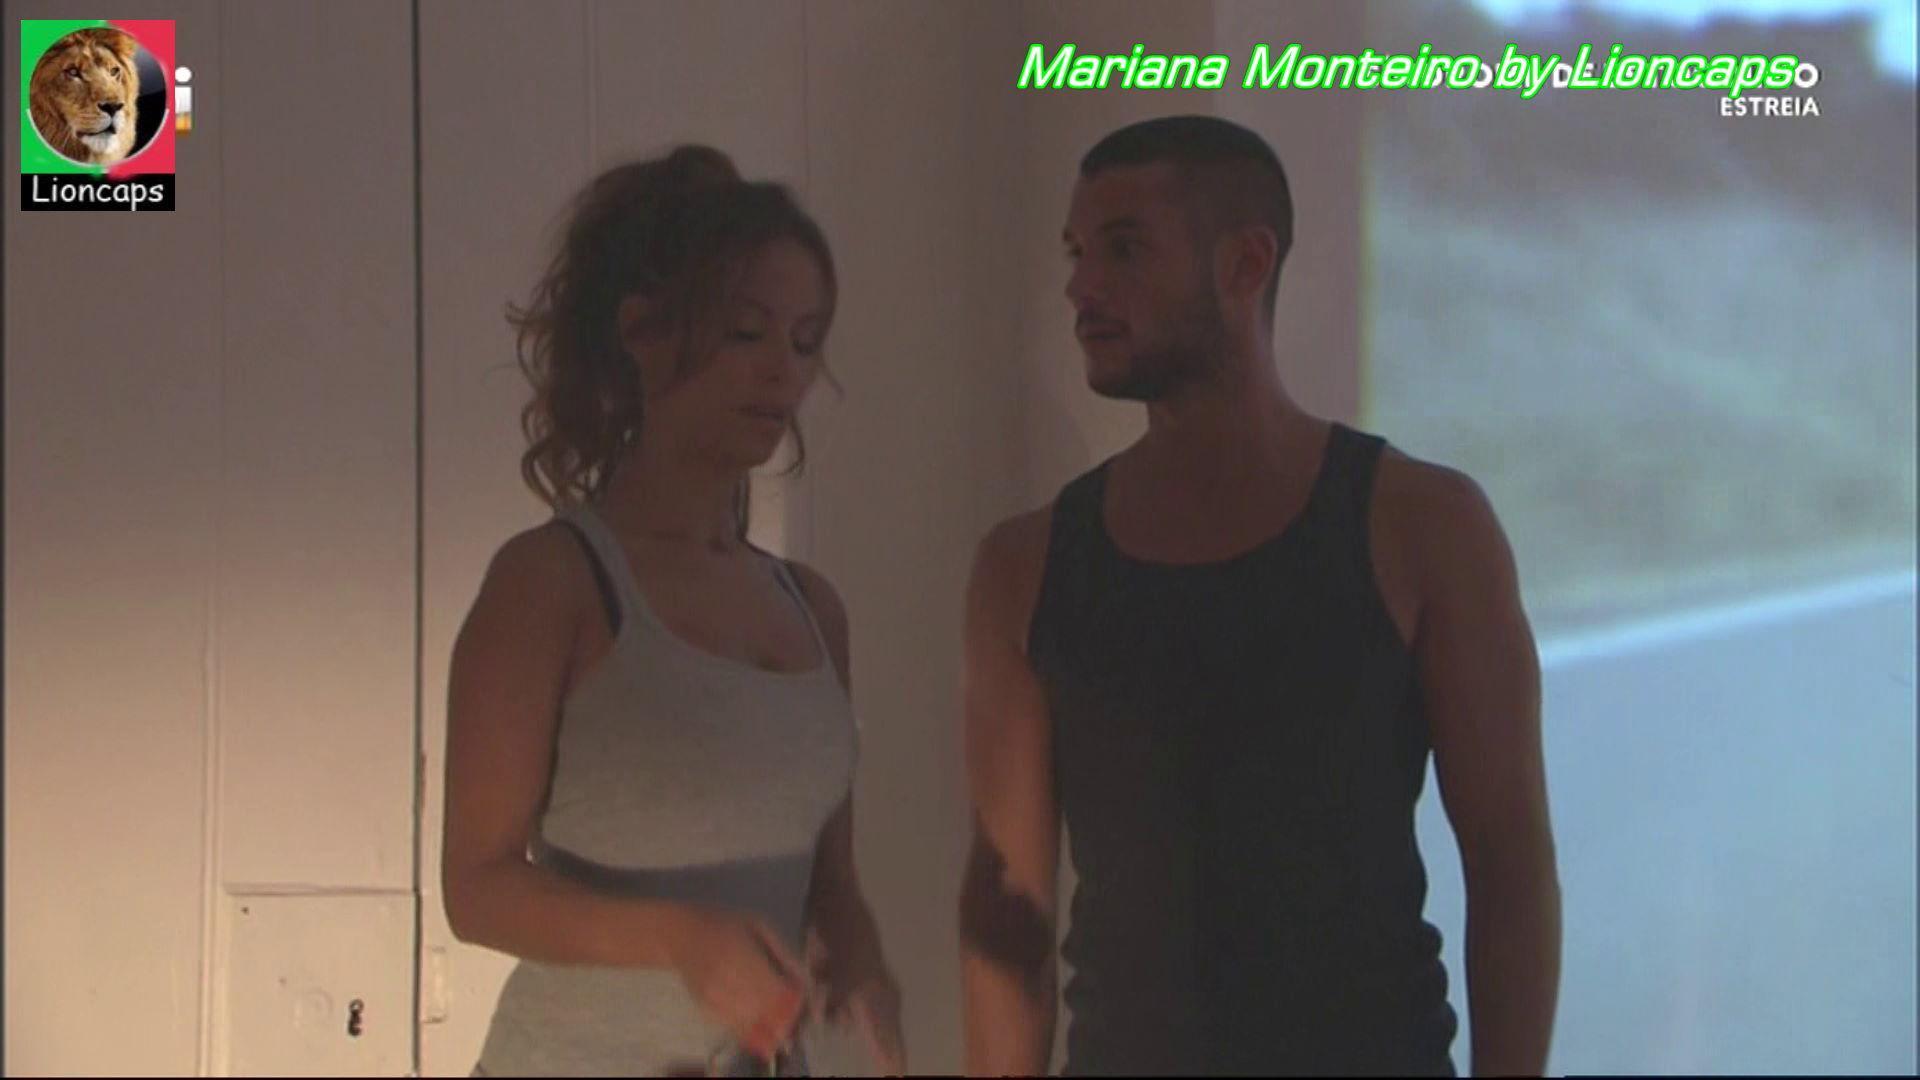 332219636_mariana_monteiro_sindrome_estocolmo_vs180130_0018_122_177lo.JPG